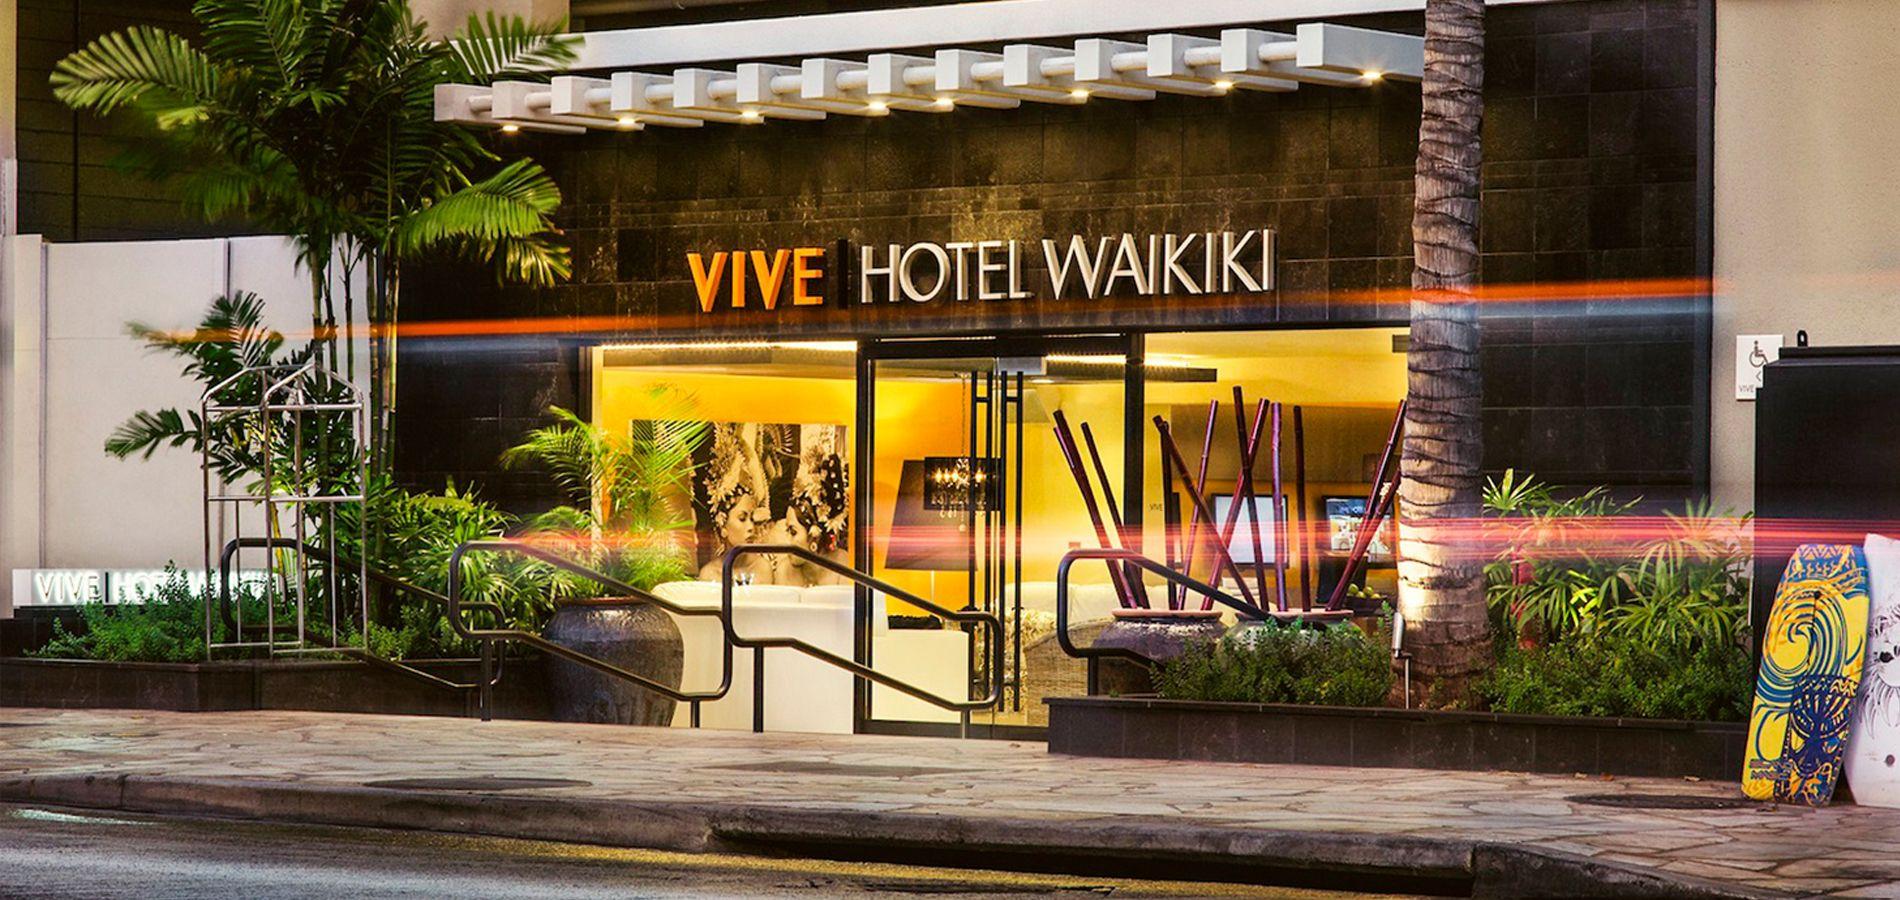 Vive Hotel Waikiki Is Honolulu S Newest Lifestyle Boutique Hotel